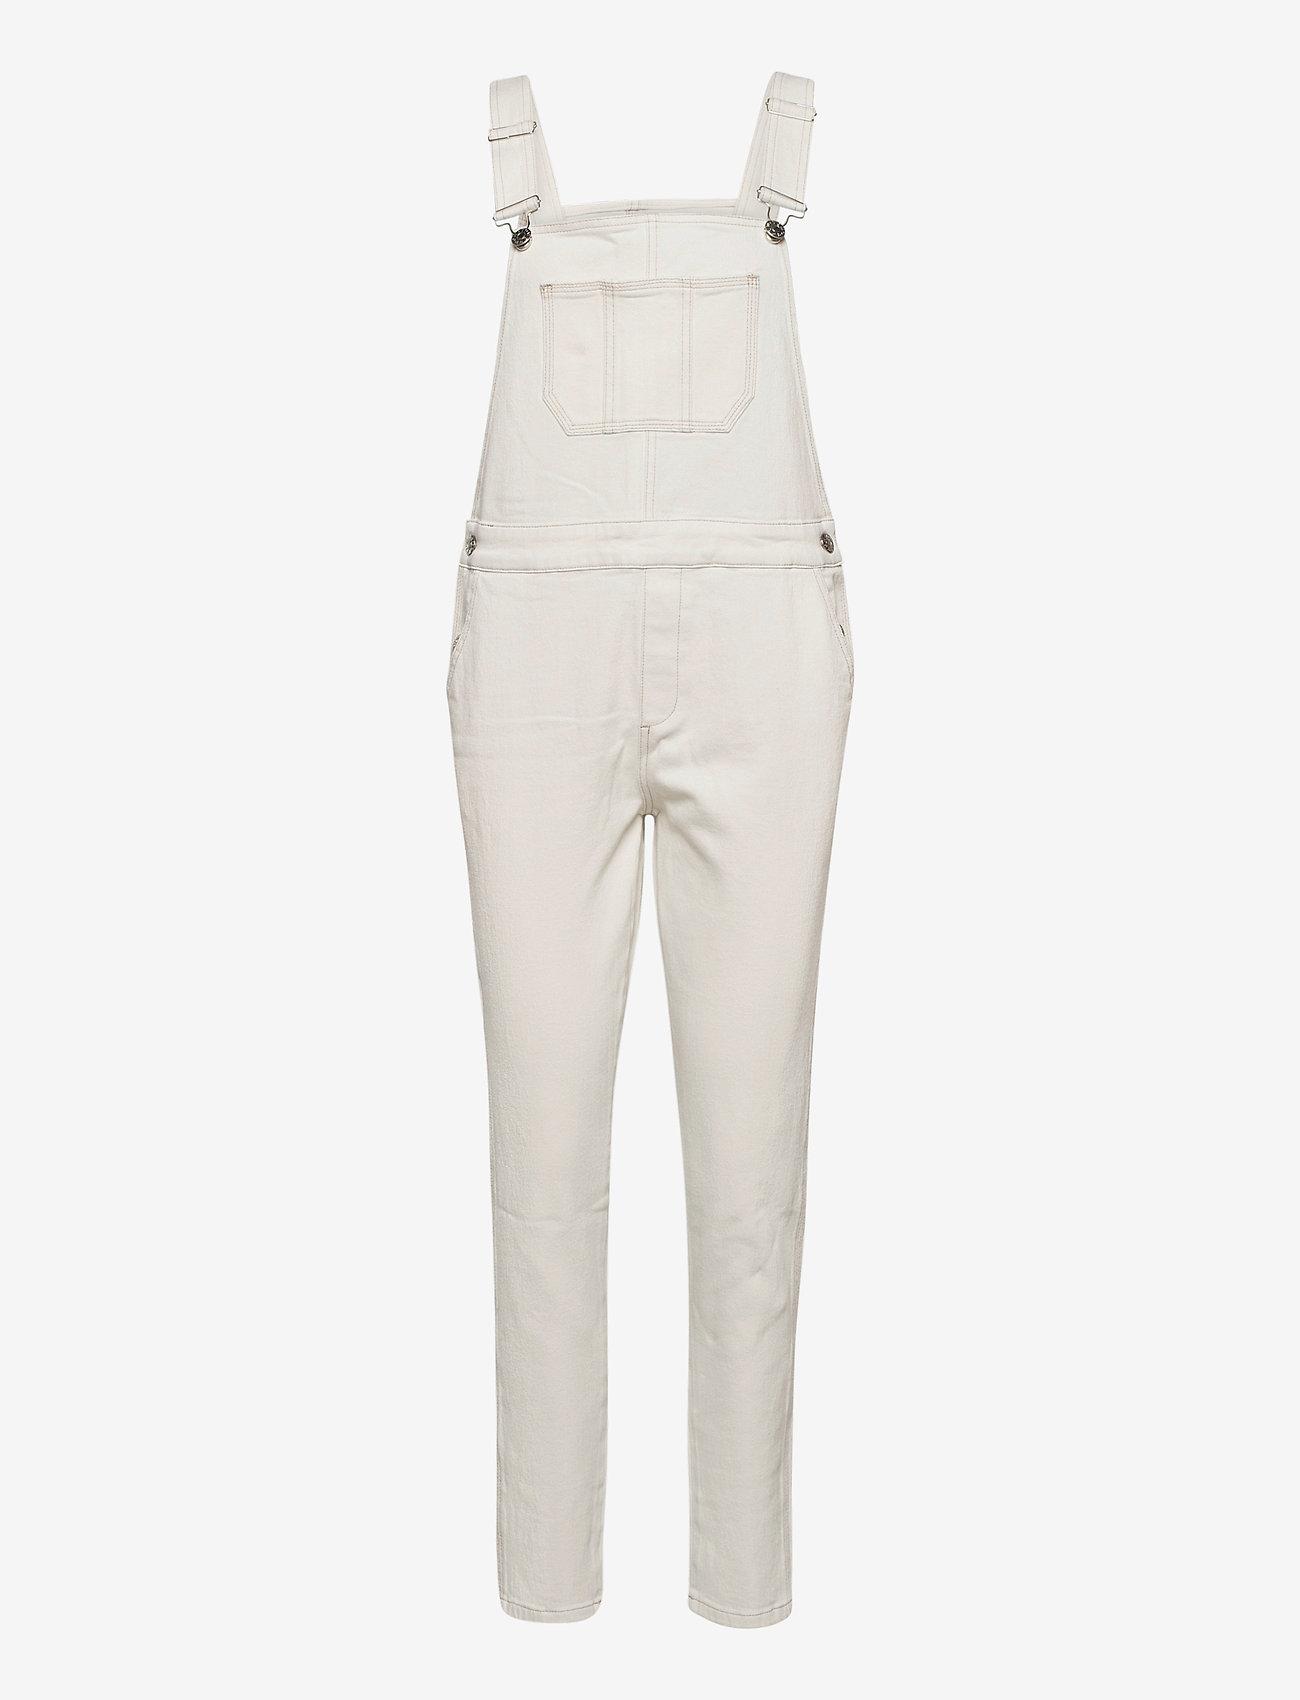 Tomorrow - Lincoln overall ecru - clothing - ecru - 0